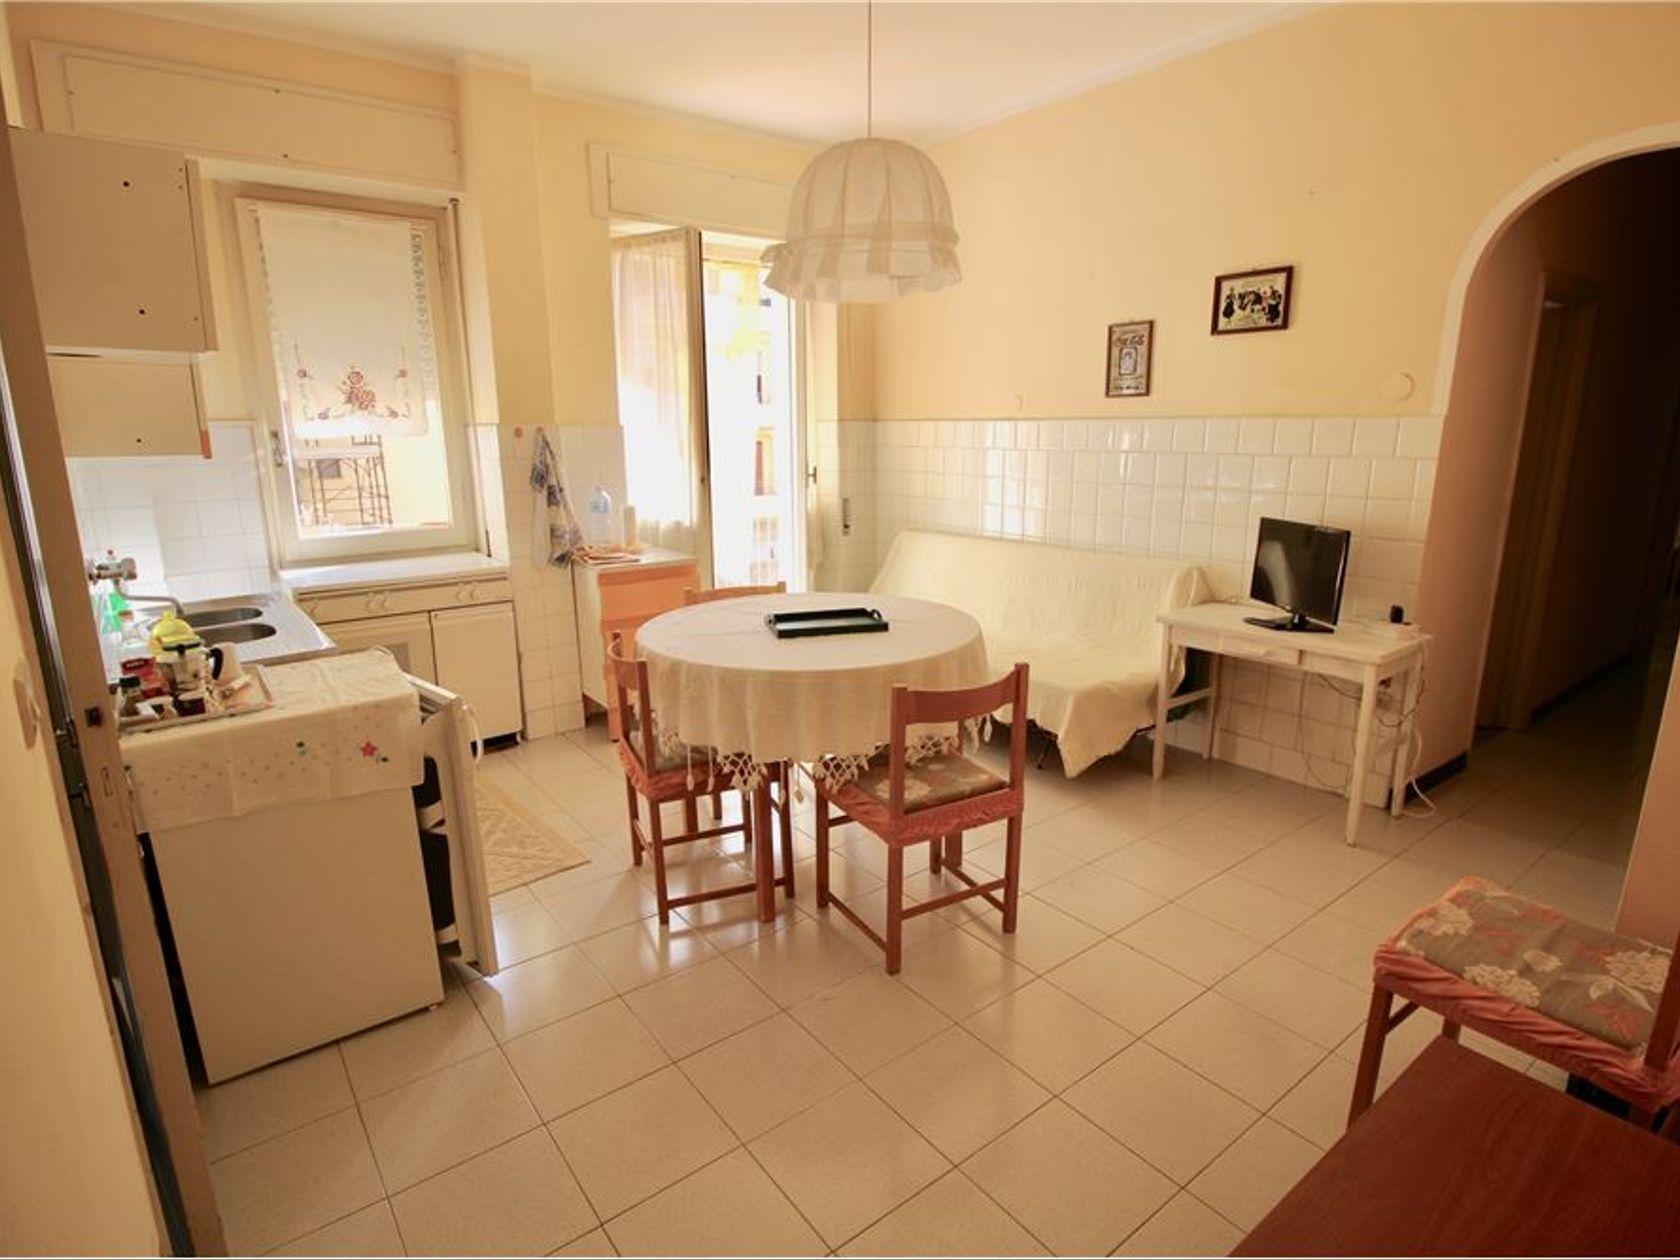 Appartamento Ss-centro, Sassari, SS Vendita - Foto 9